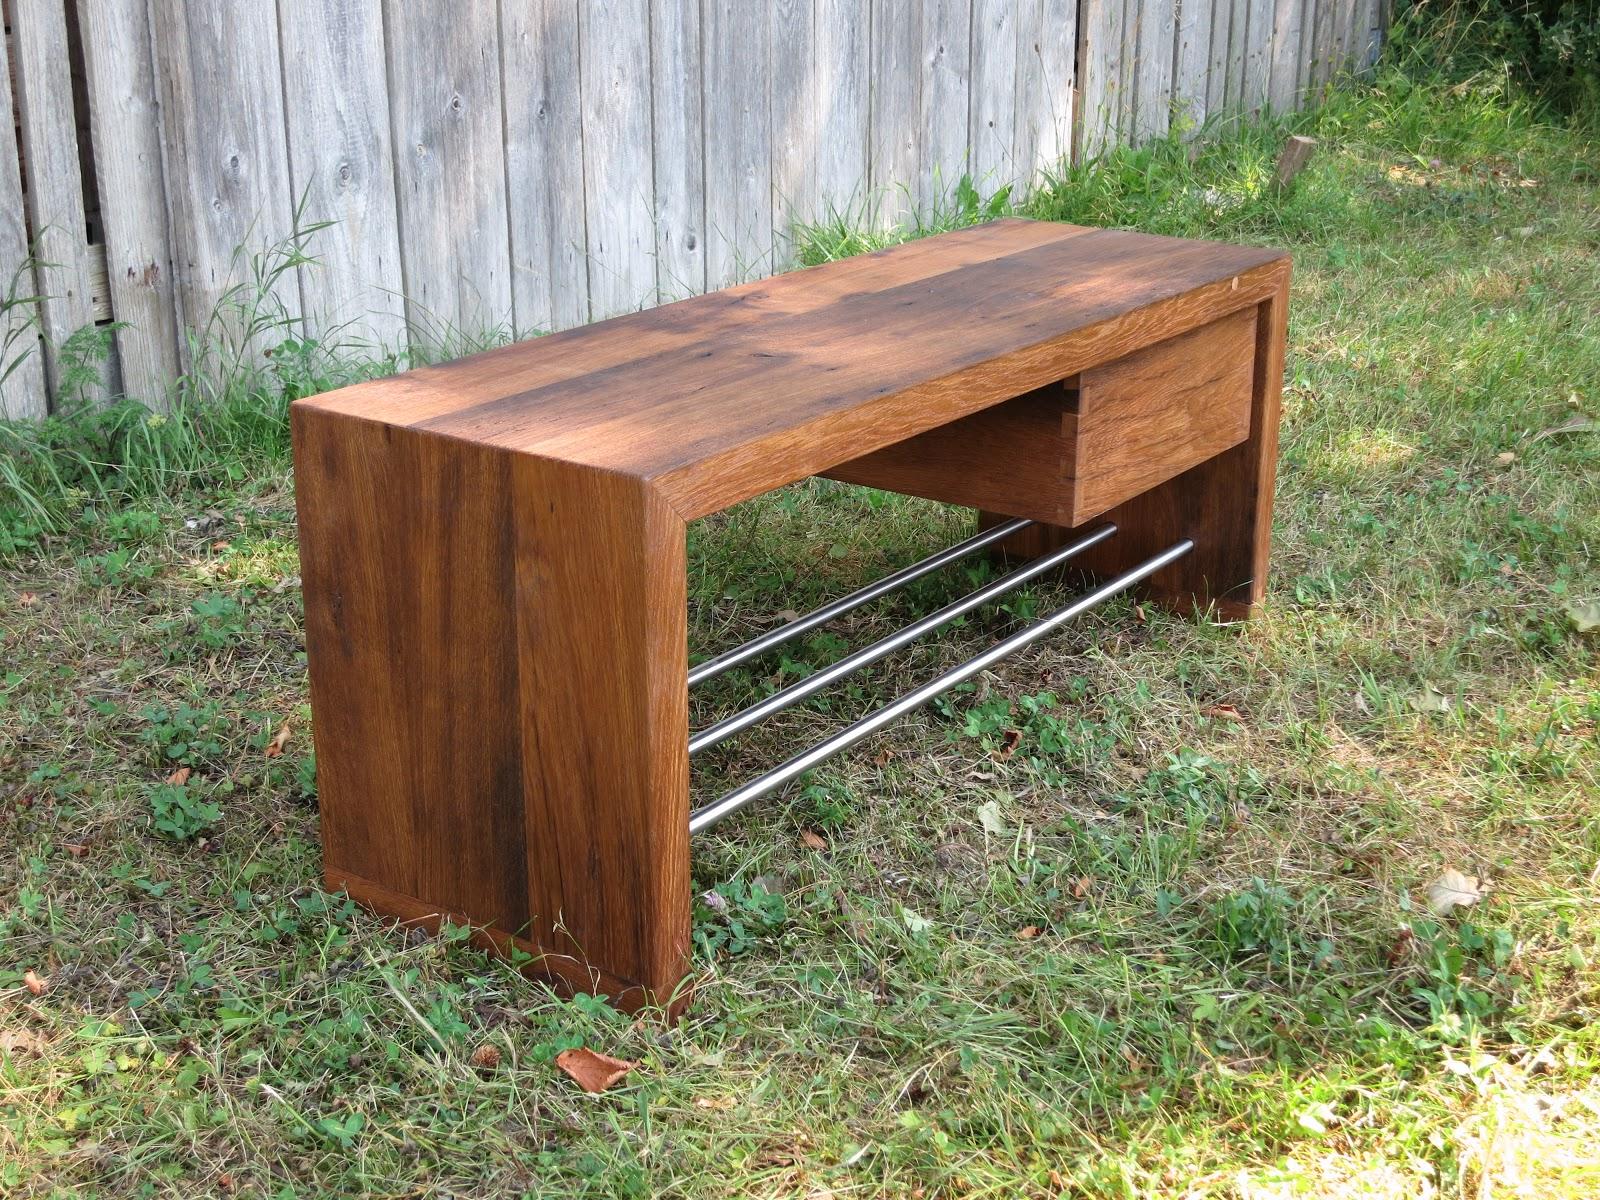 tischlerei kl pfer blog november 2012. Black Bedroom Furniture Sets. Home Design Ideas